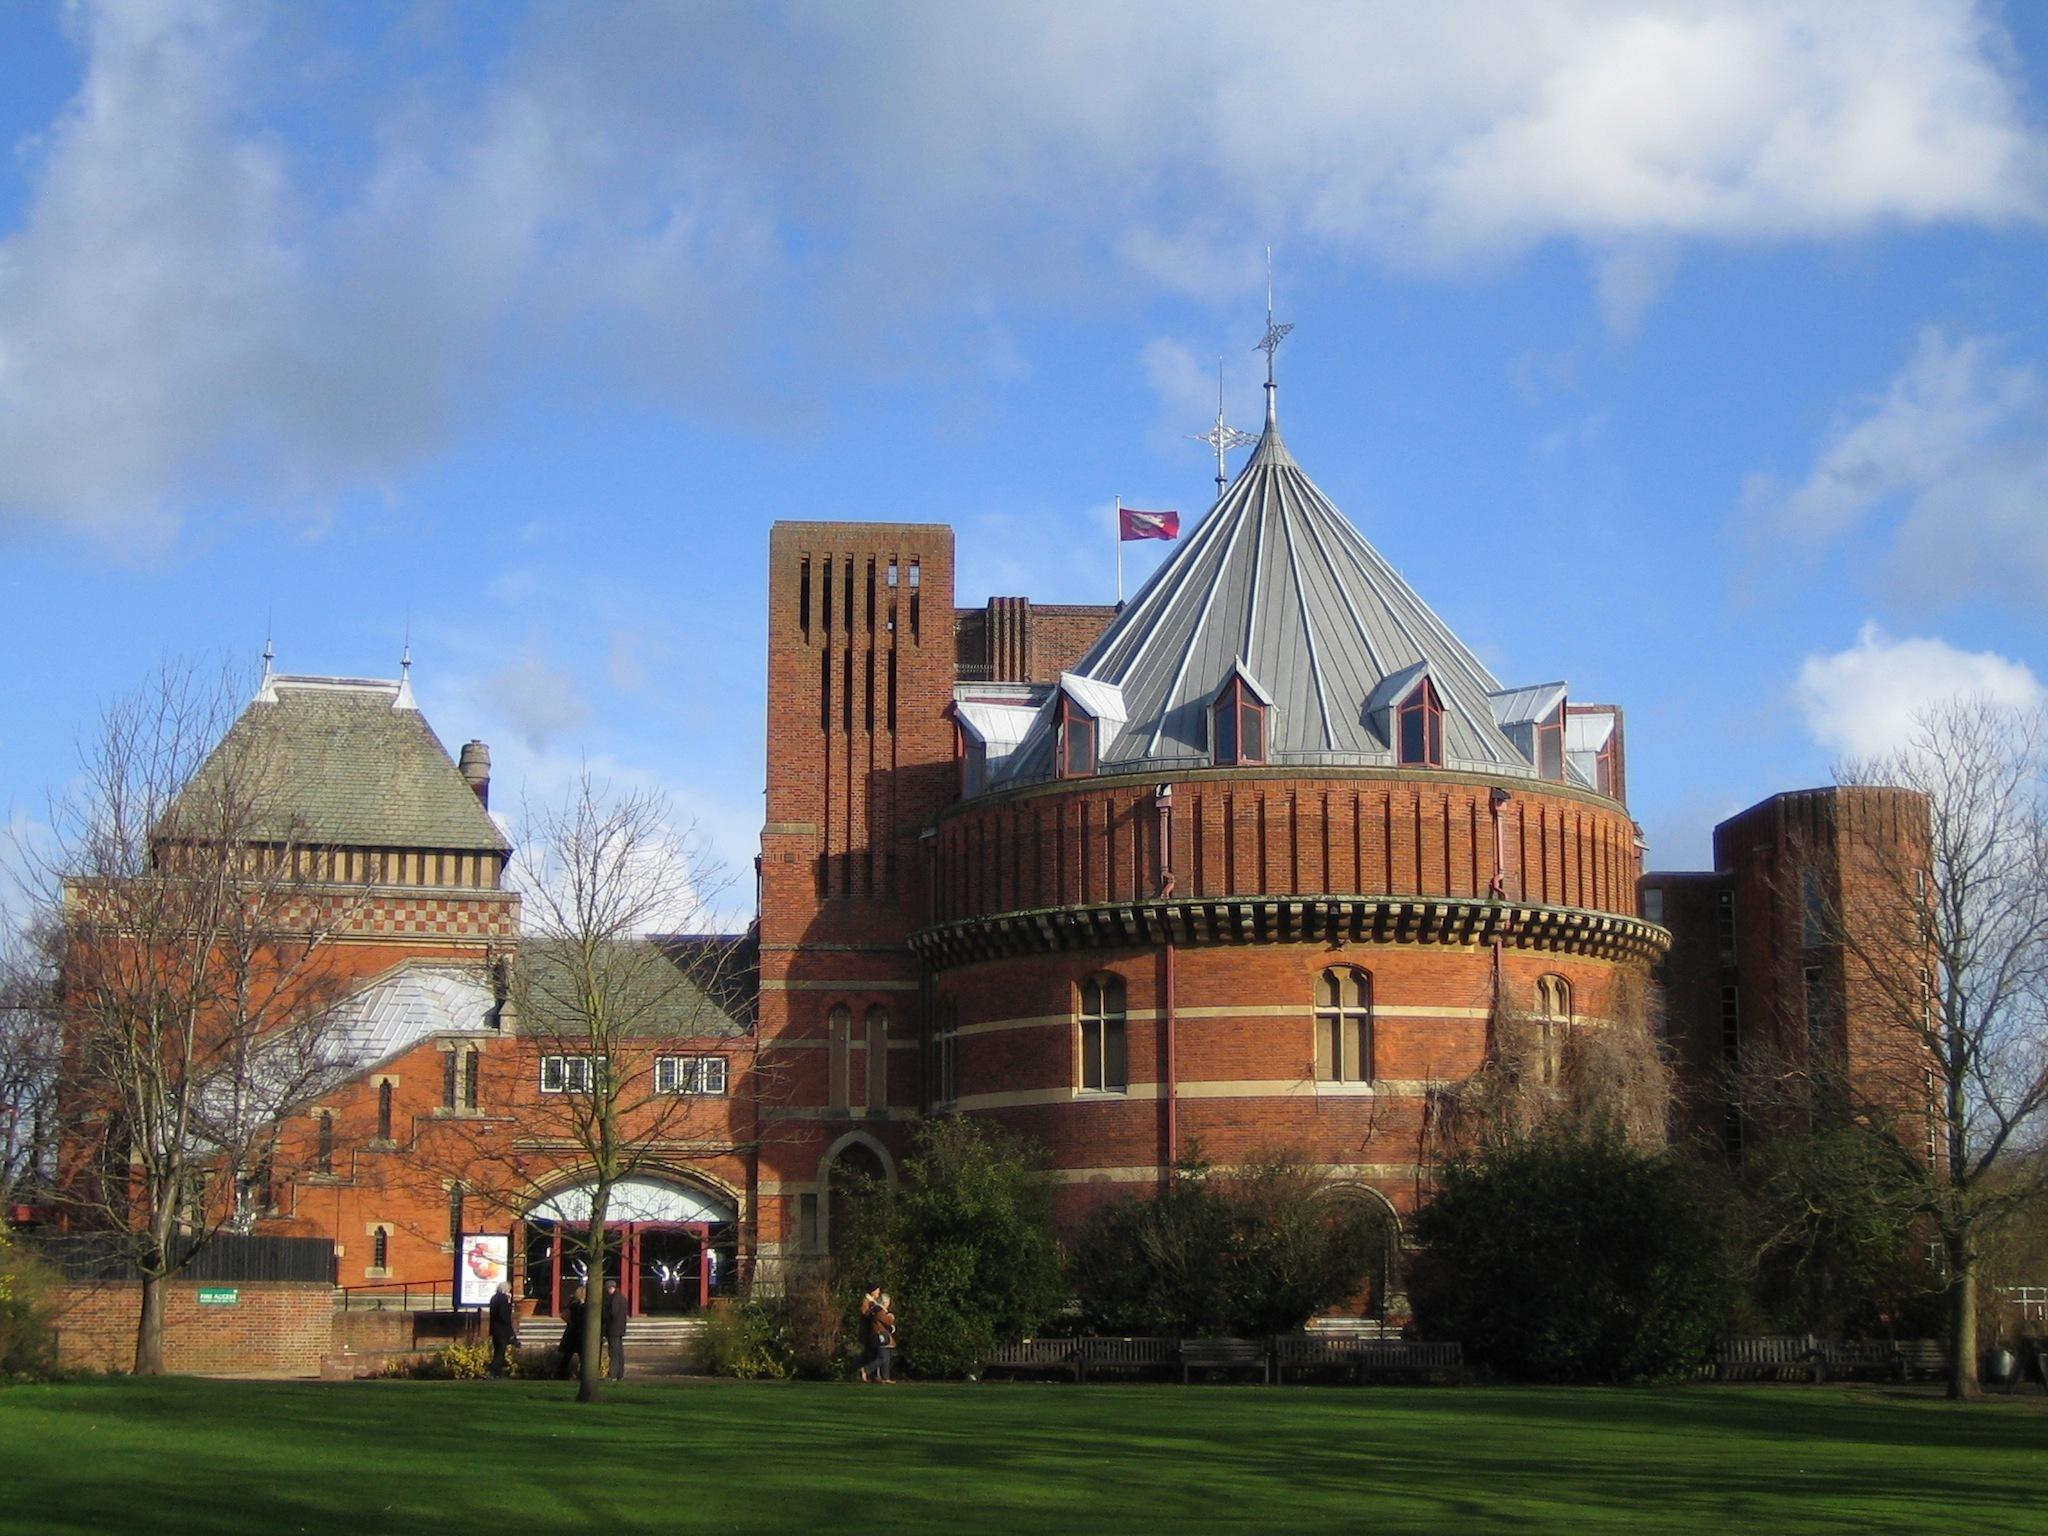 RSC Stratford upon Avon